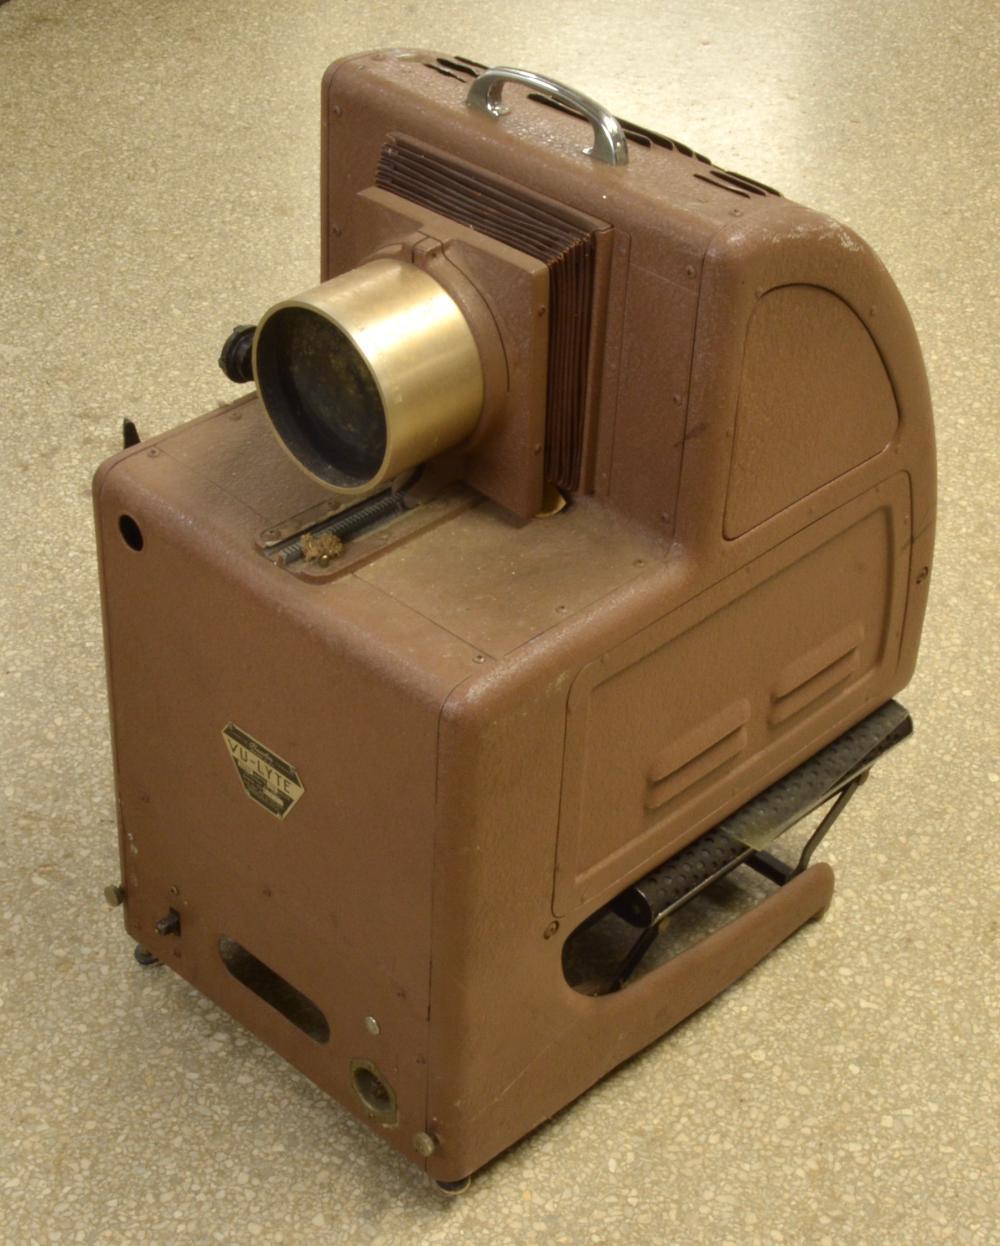 Vintage Charles Beseler VU-LYTE Projector